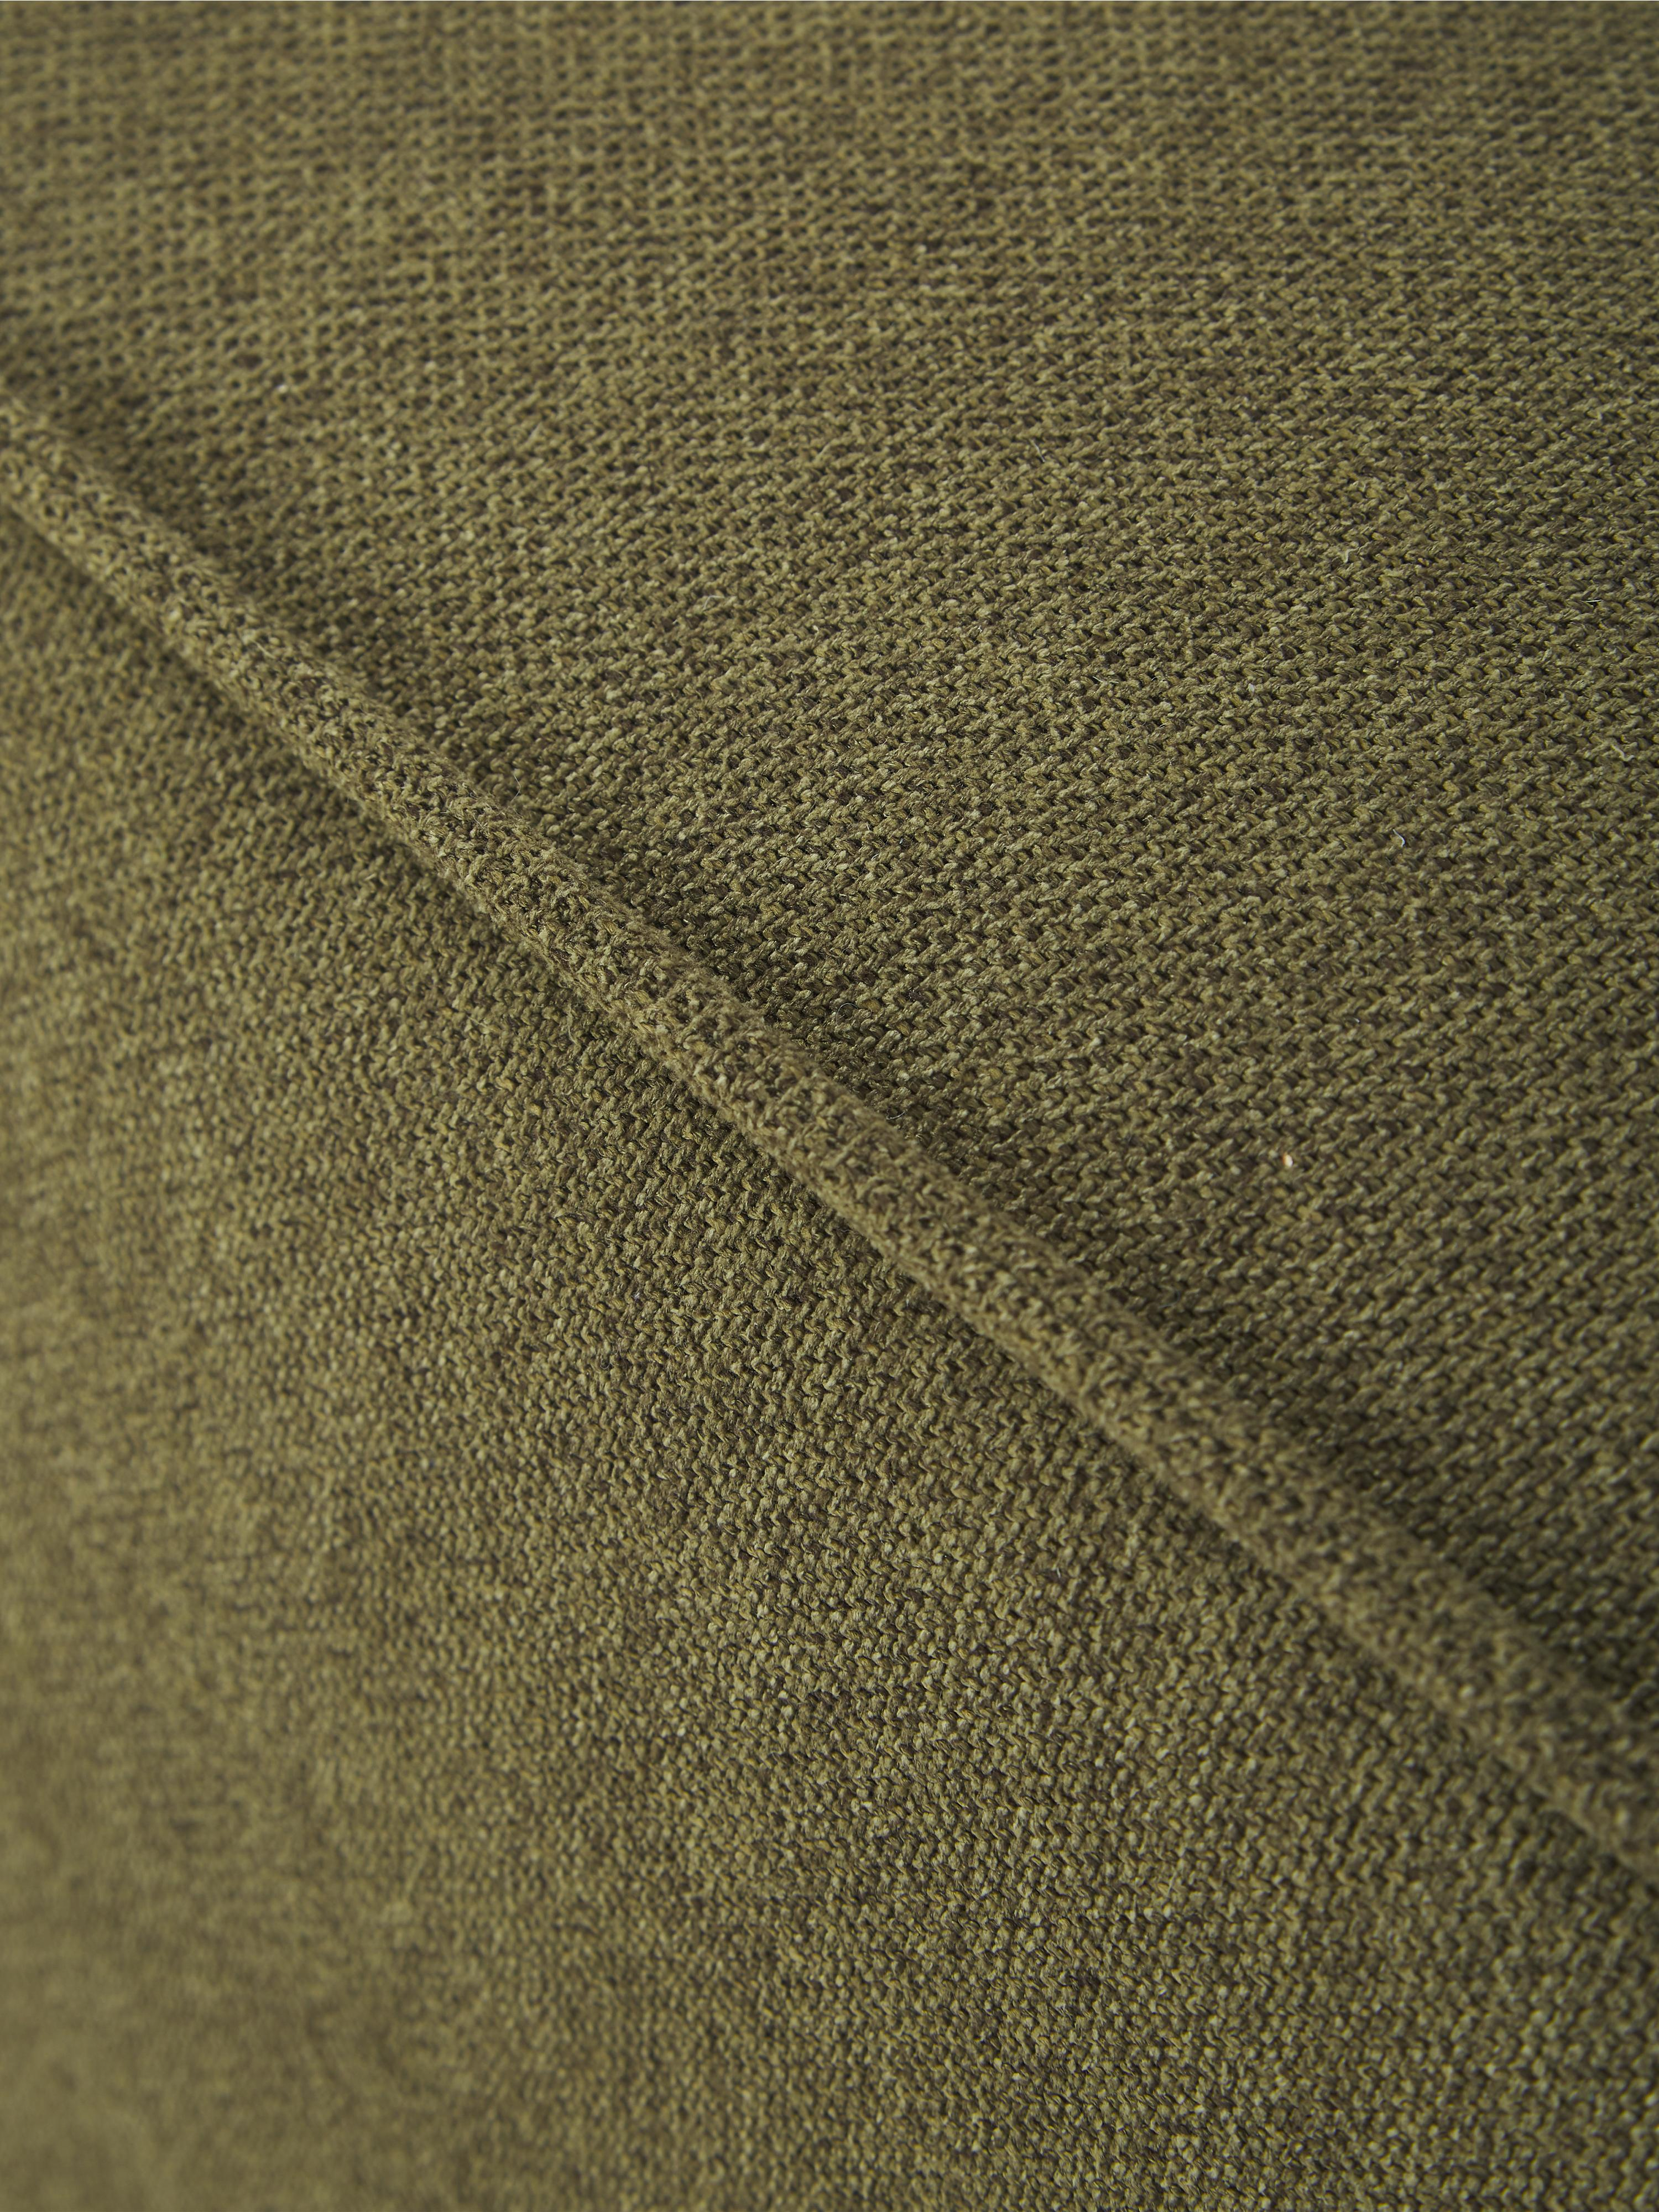 Modulares Sofa Lennon (3-Sitzer), Bezug: Polyester Der hochwertige, Gestell: Massives Kiefernholz, Spe, Füße: Kunststoff, Webstoff Grün, B 238 x T 119 cm